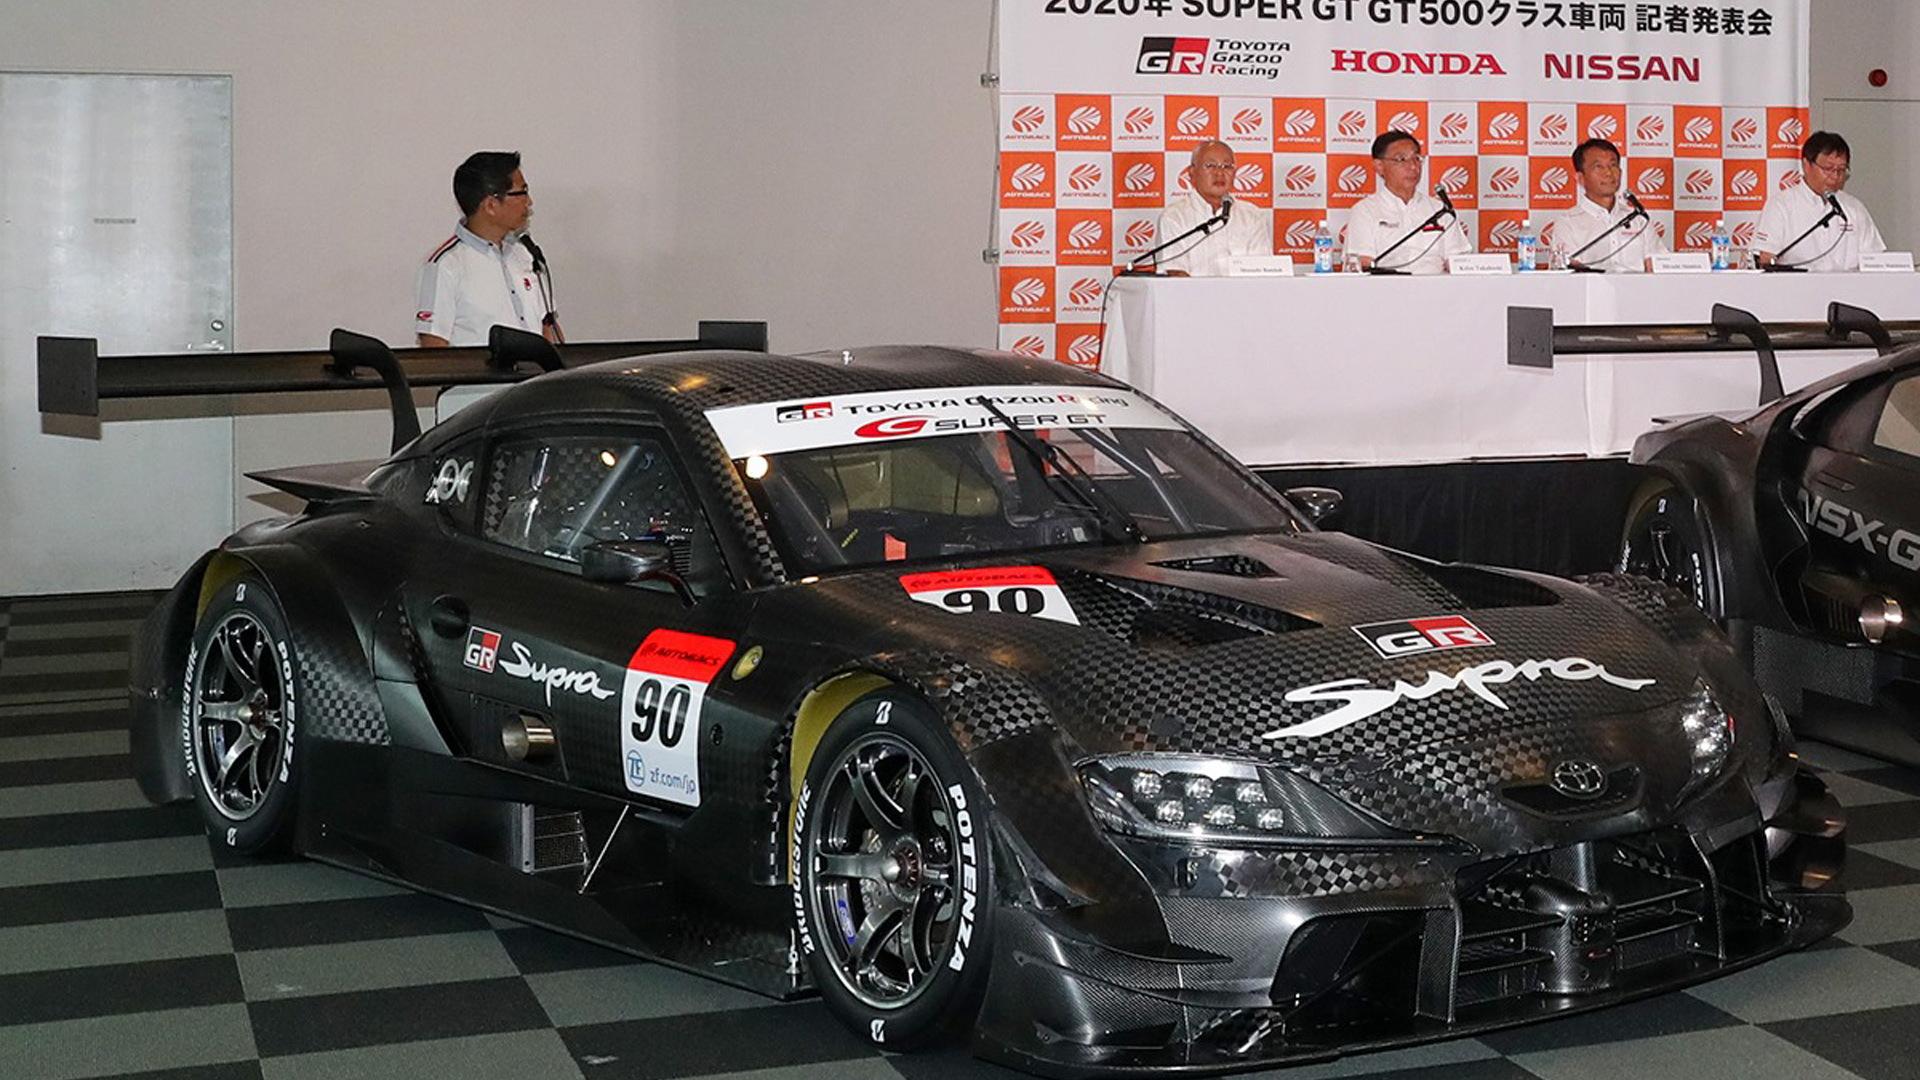 2020 Toyota GR Supra GT500 Super GT race car